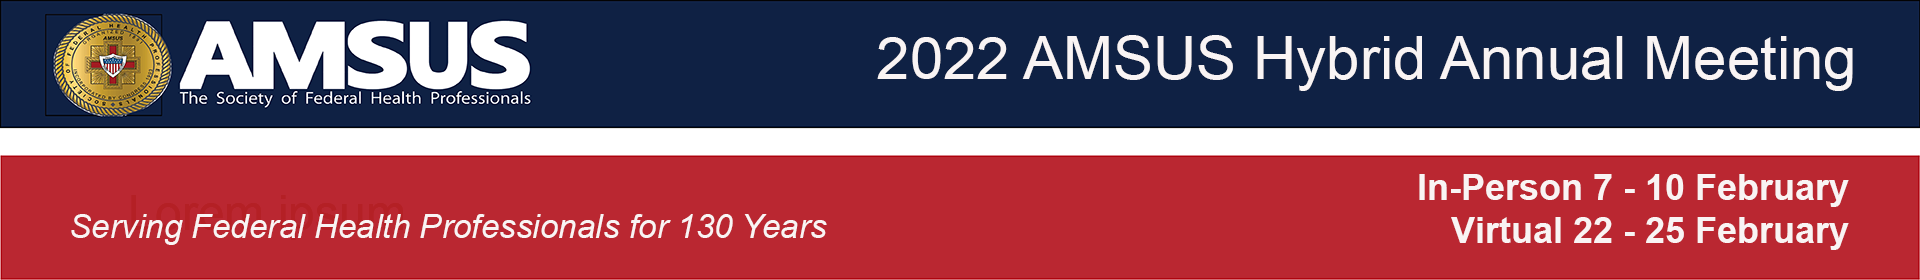 2021/2022 AMSUS Awards Program Event Banner